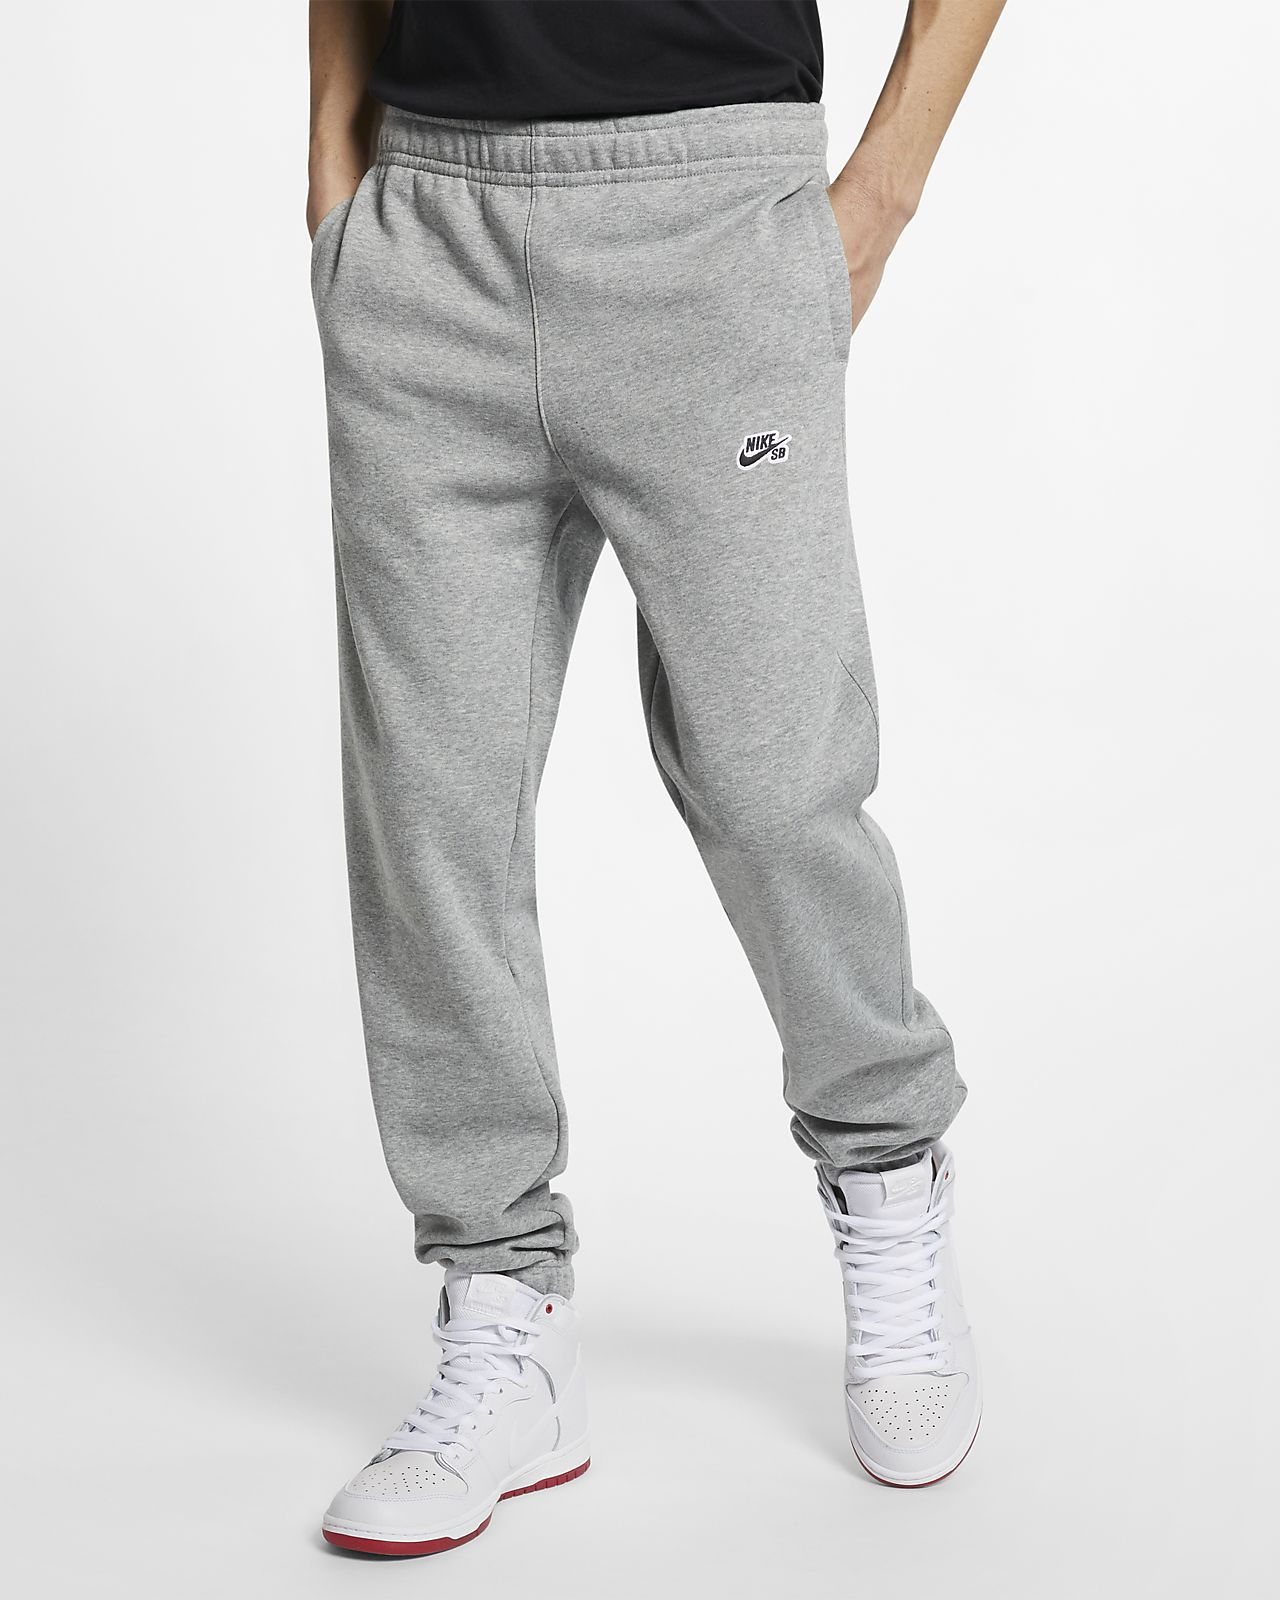 d7da2cd3df23 Nike SB Icon Men s Fleece Skate Pants. Nike.com